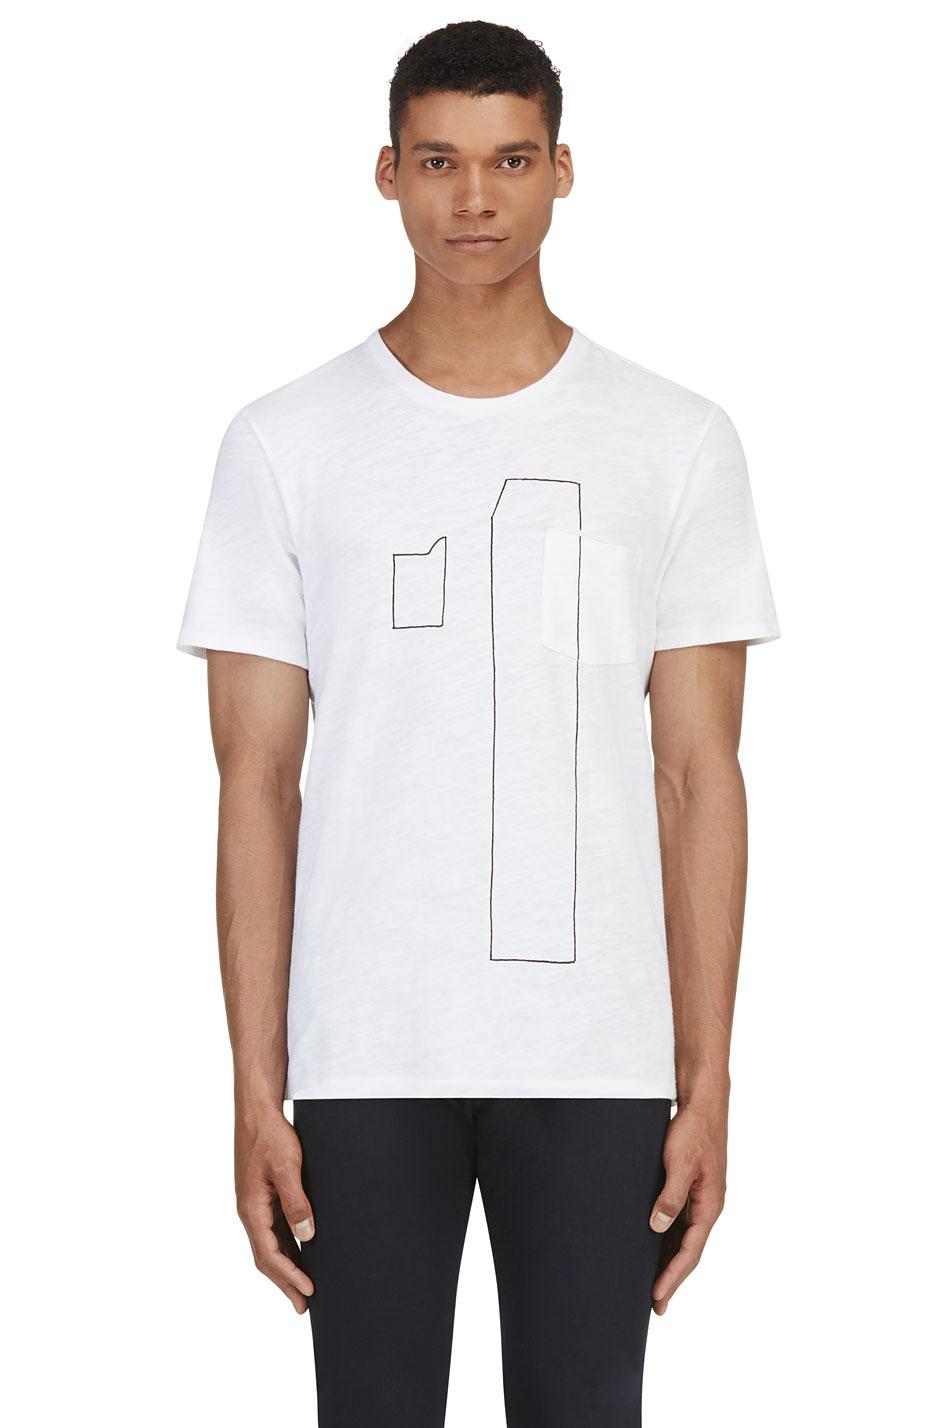 Rag and bone white number t shirt for Rag and bone white t shirt